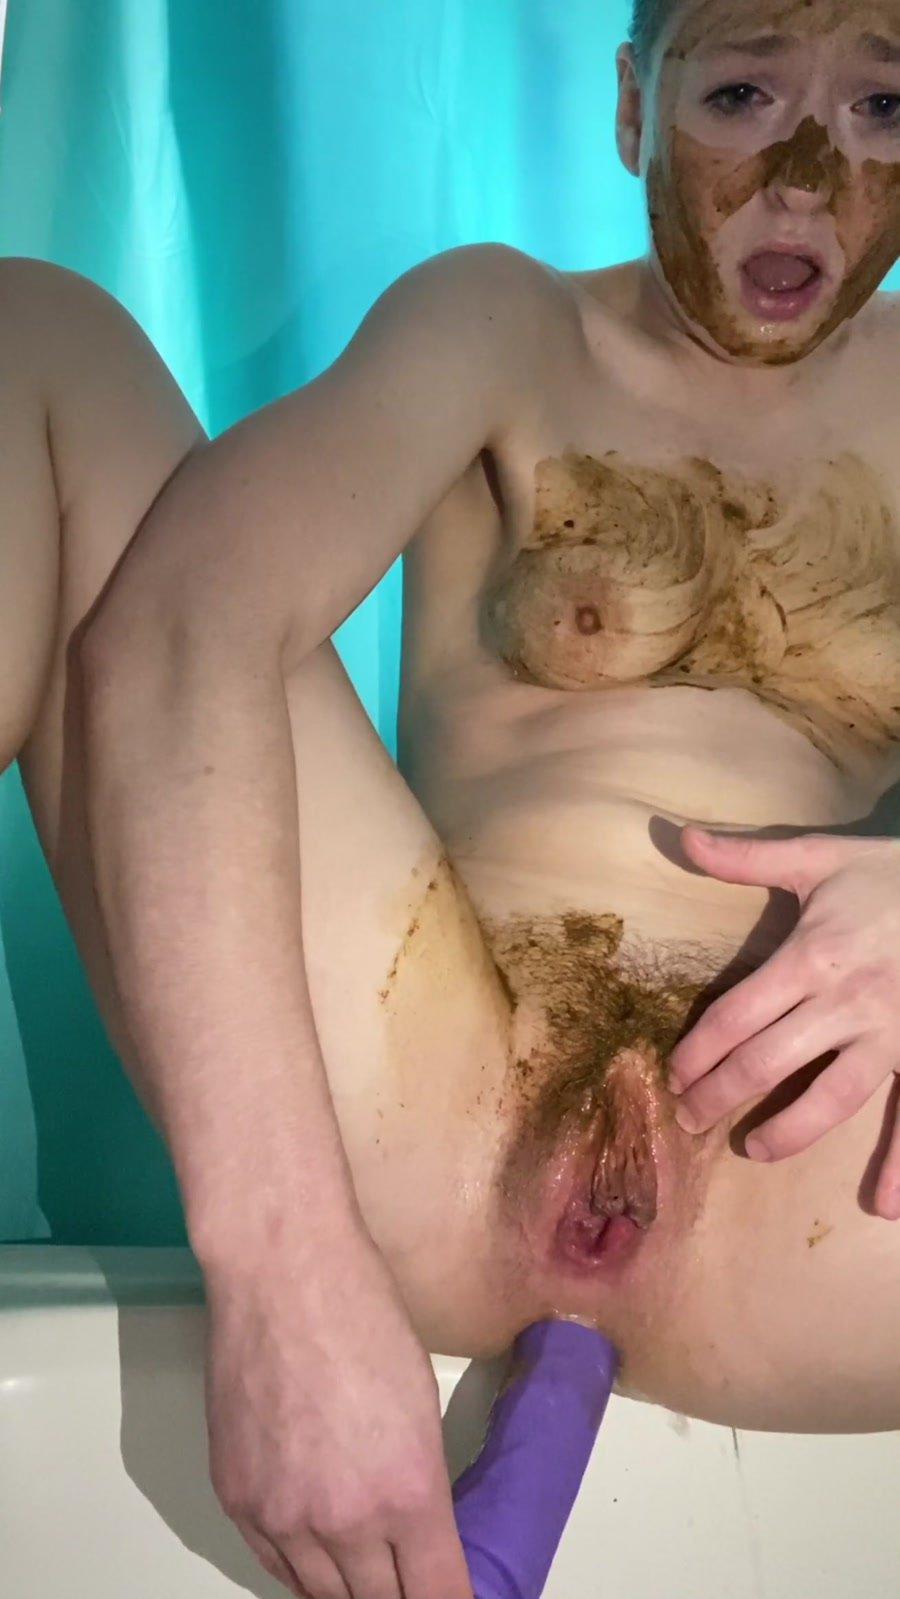 Fun And Porn solo scat: (sexandcandy18) - lots of fun! [ultrahd 4k